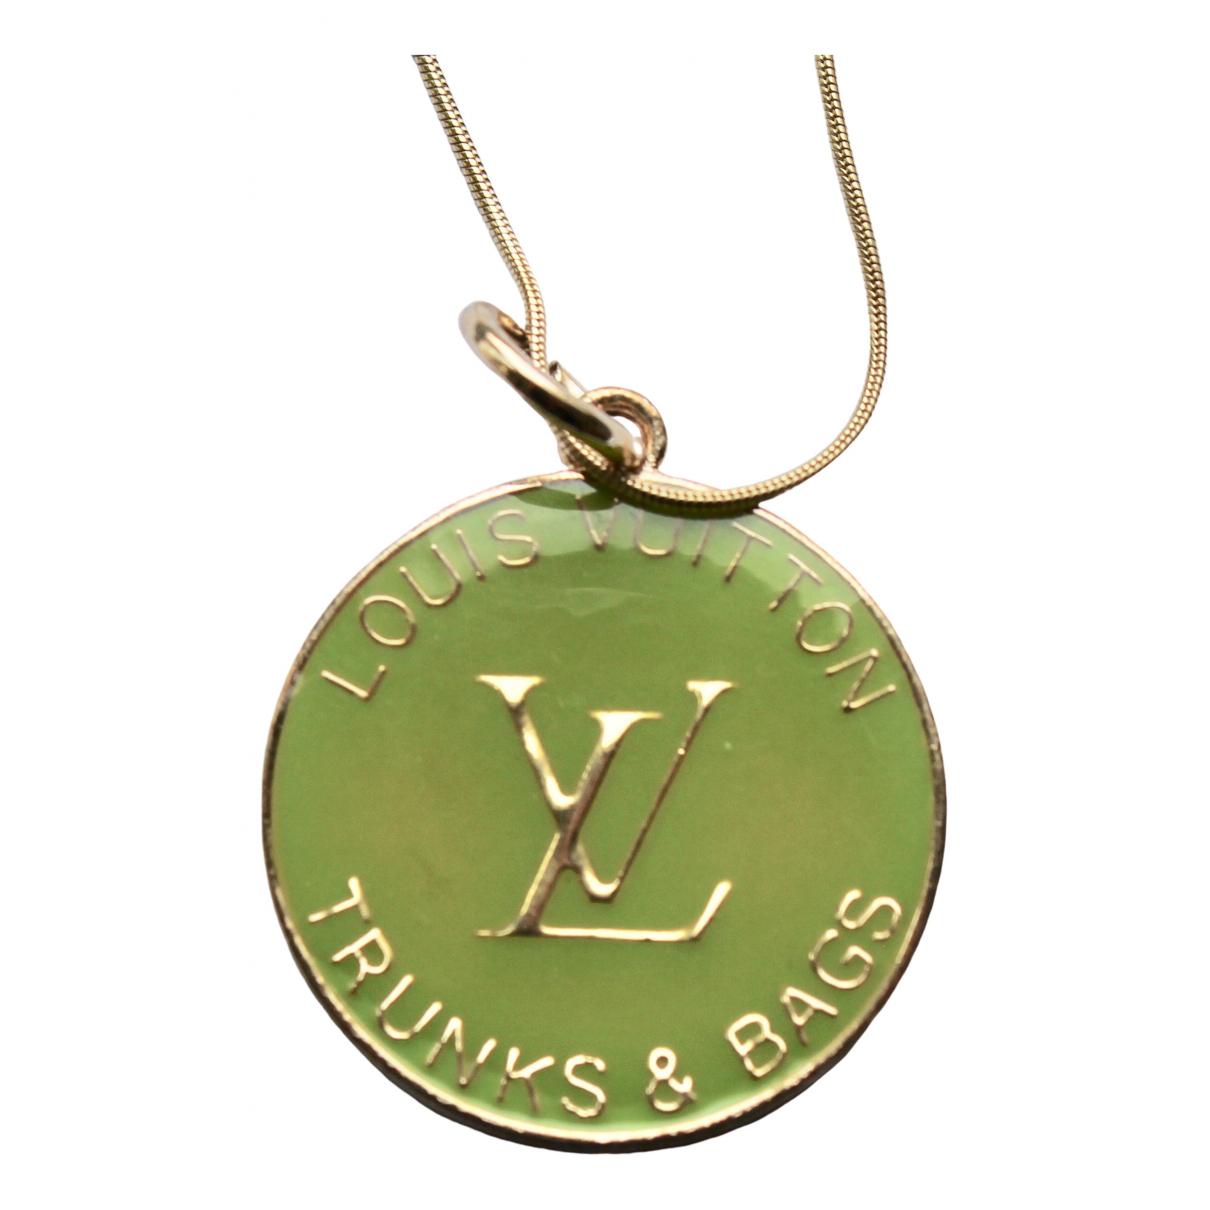 Colgante Louis Vuitton